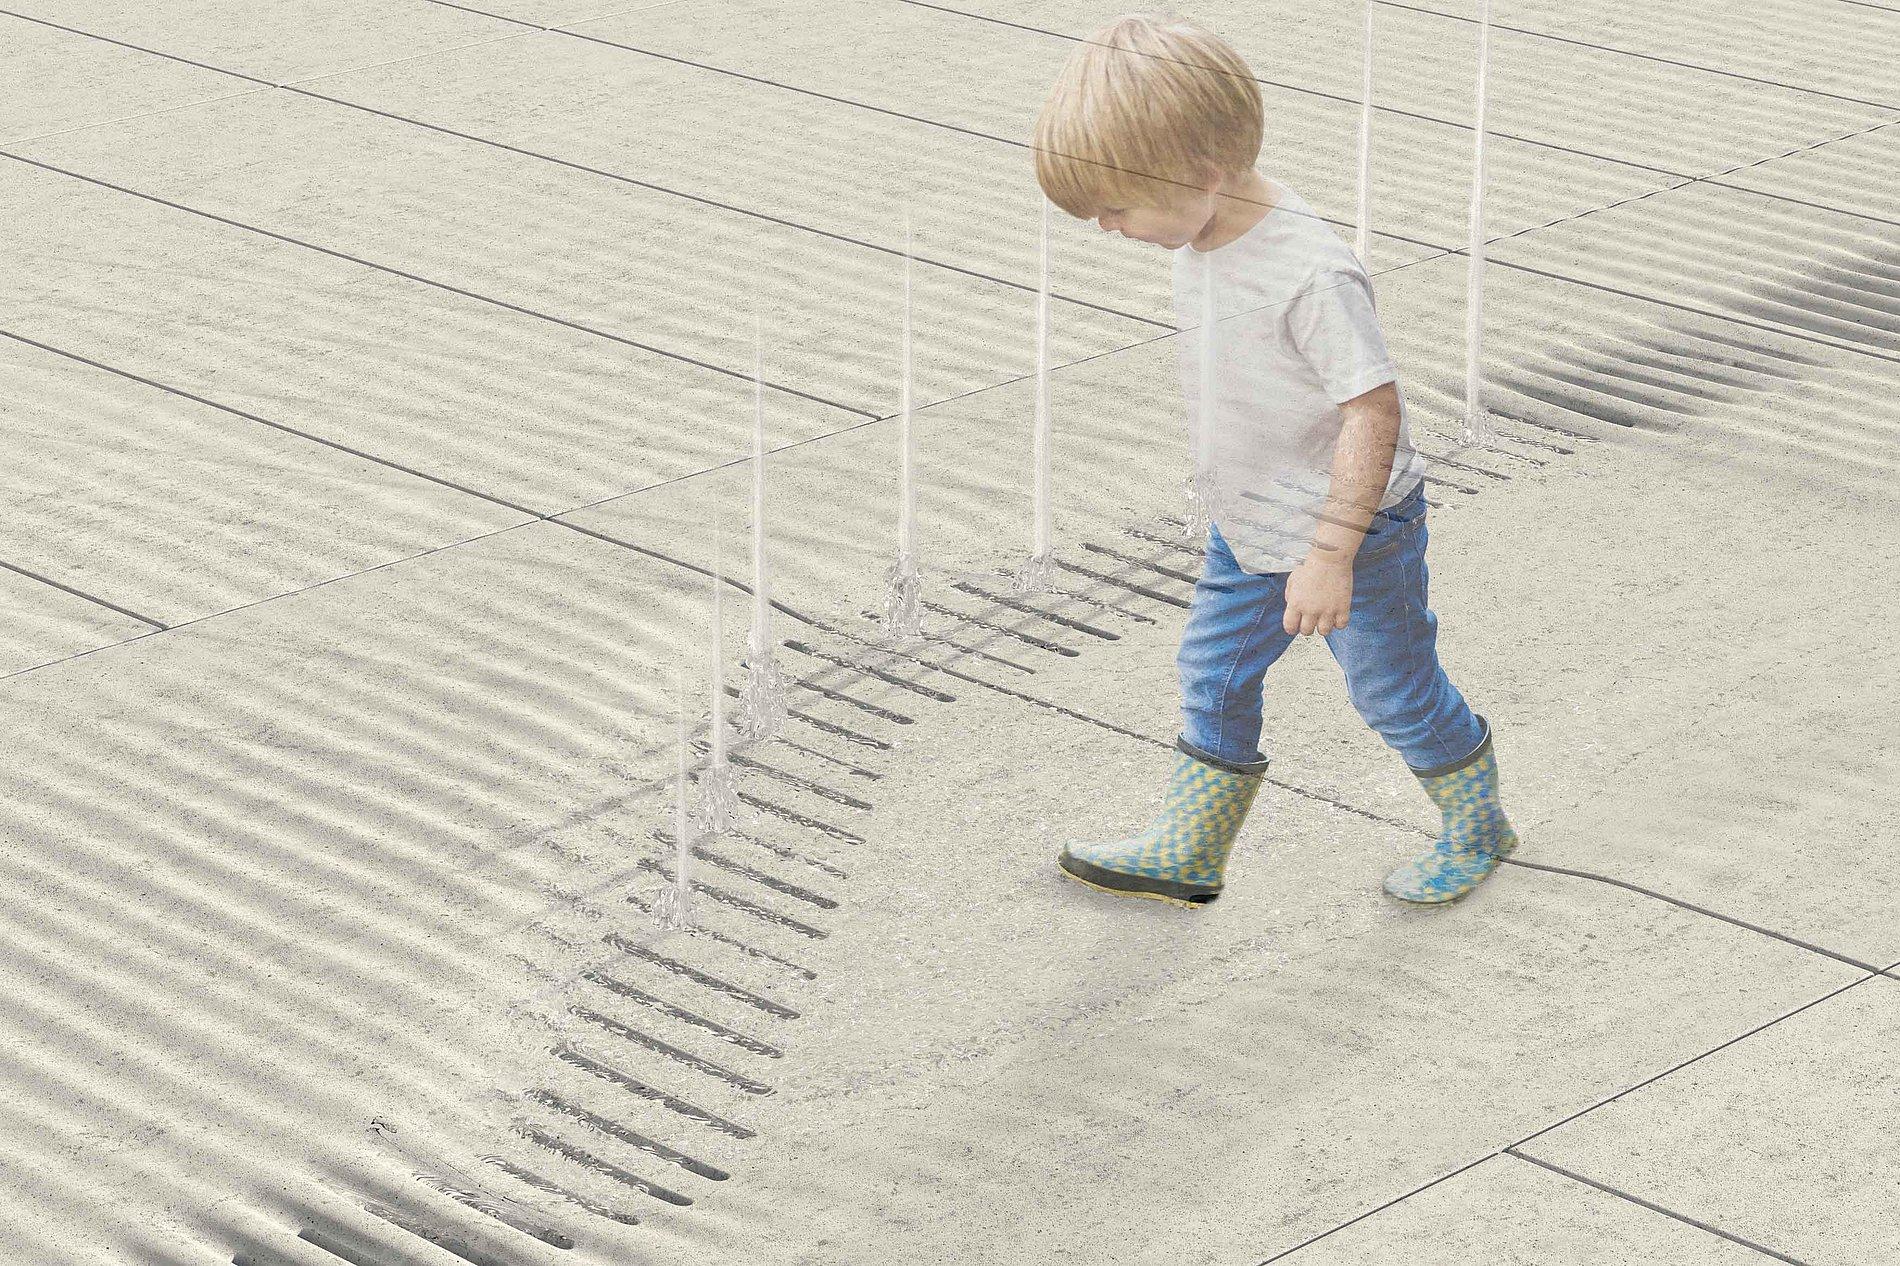 RESEAU, urban water management | Red Dot Design Award